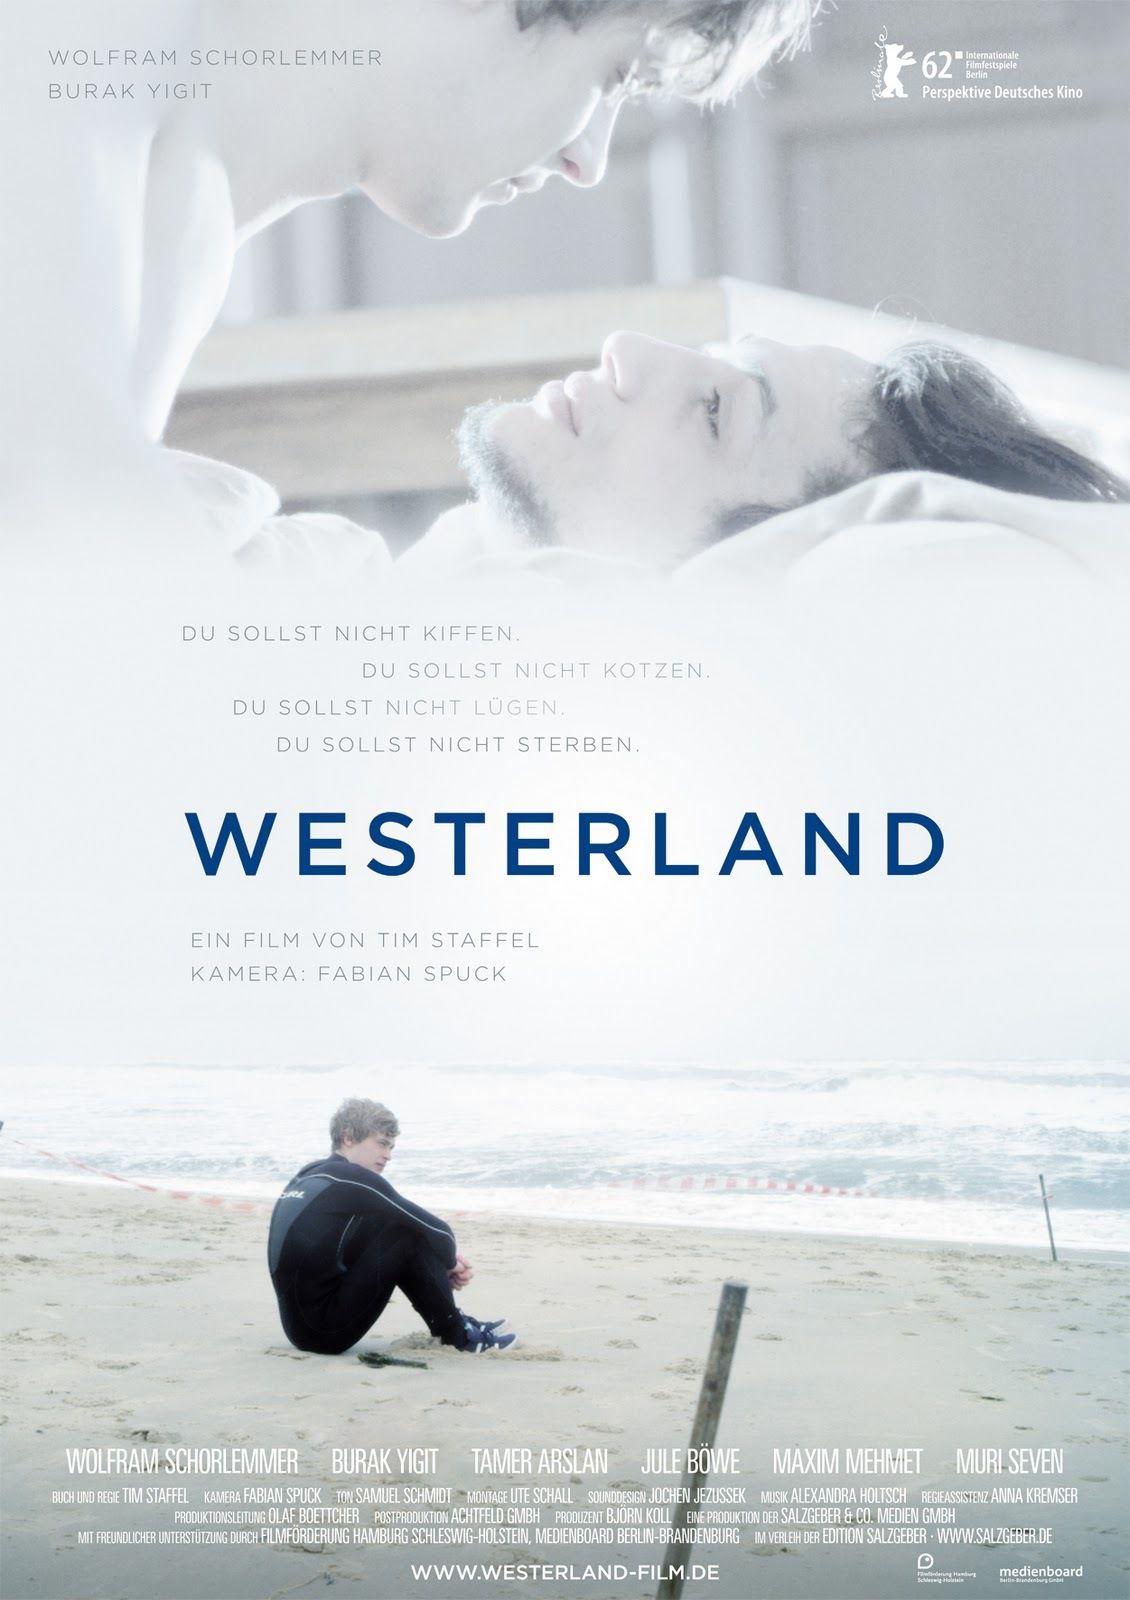 Westerland - Film (2013)